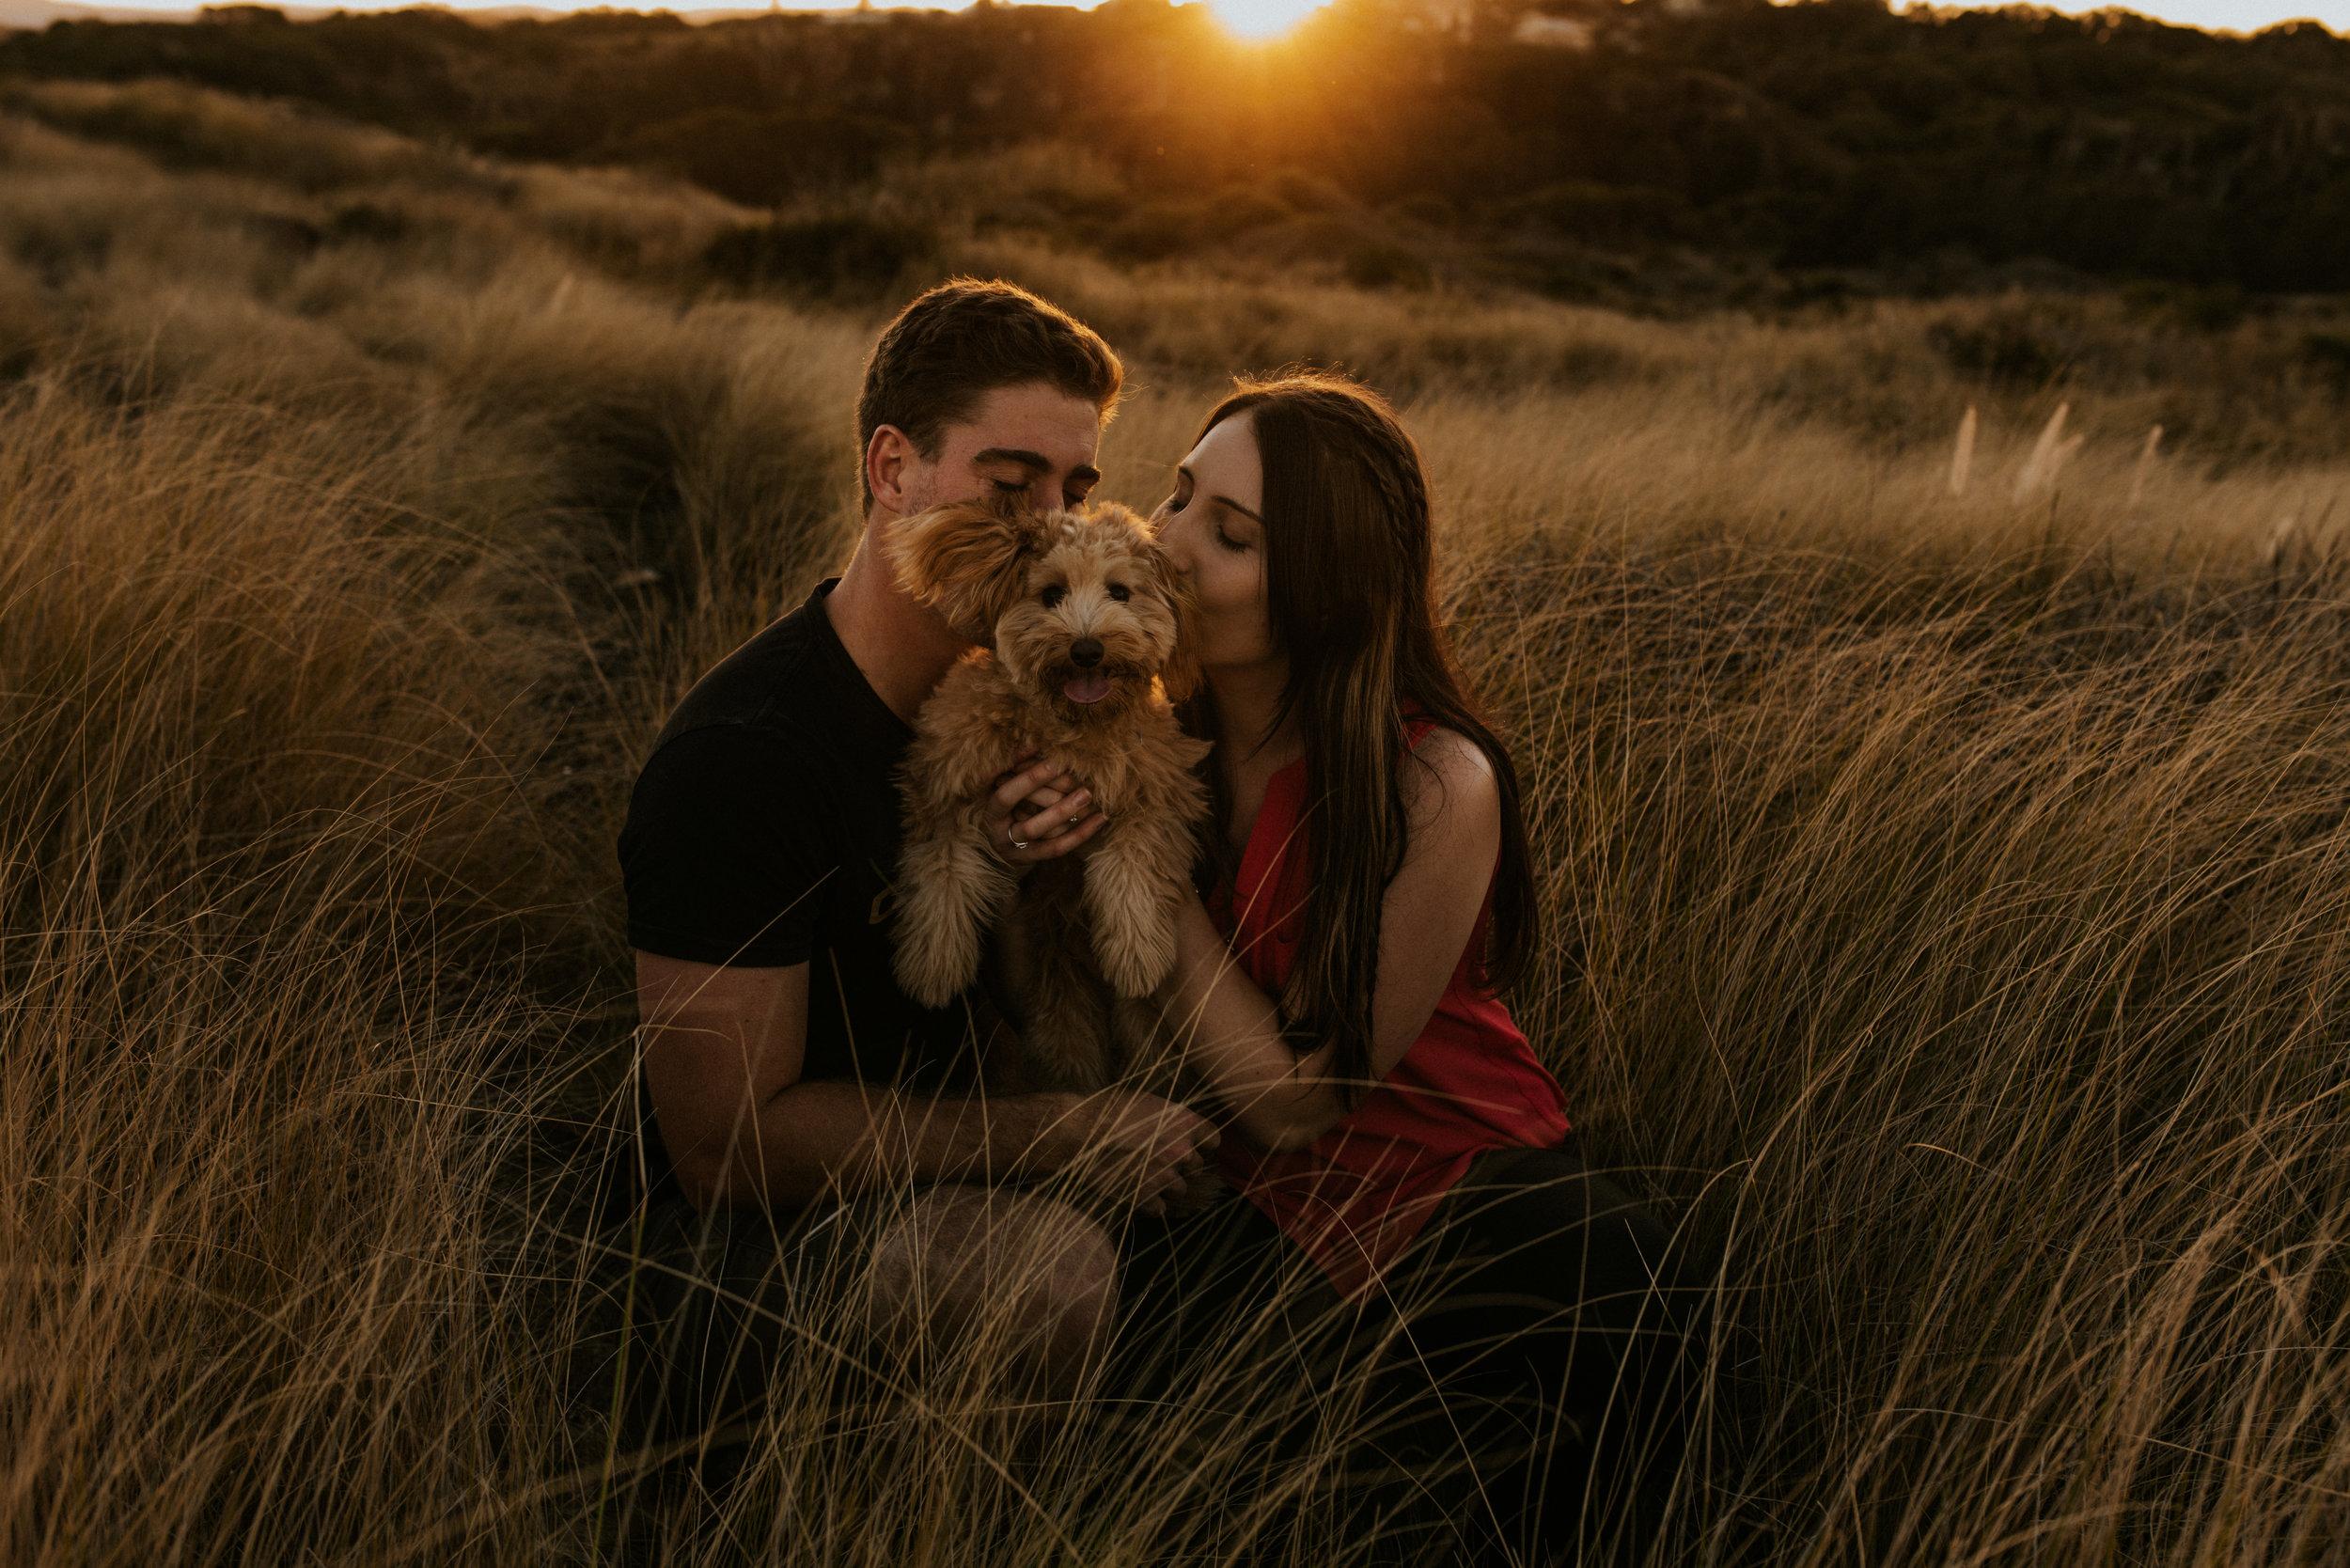 Dani & Rob - Kiama Sunset Engagement      6th May 2018